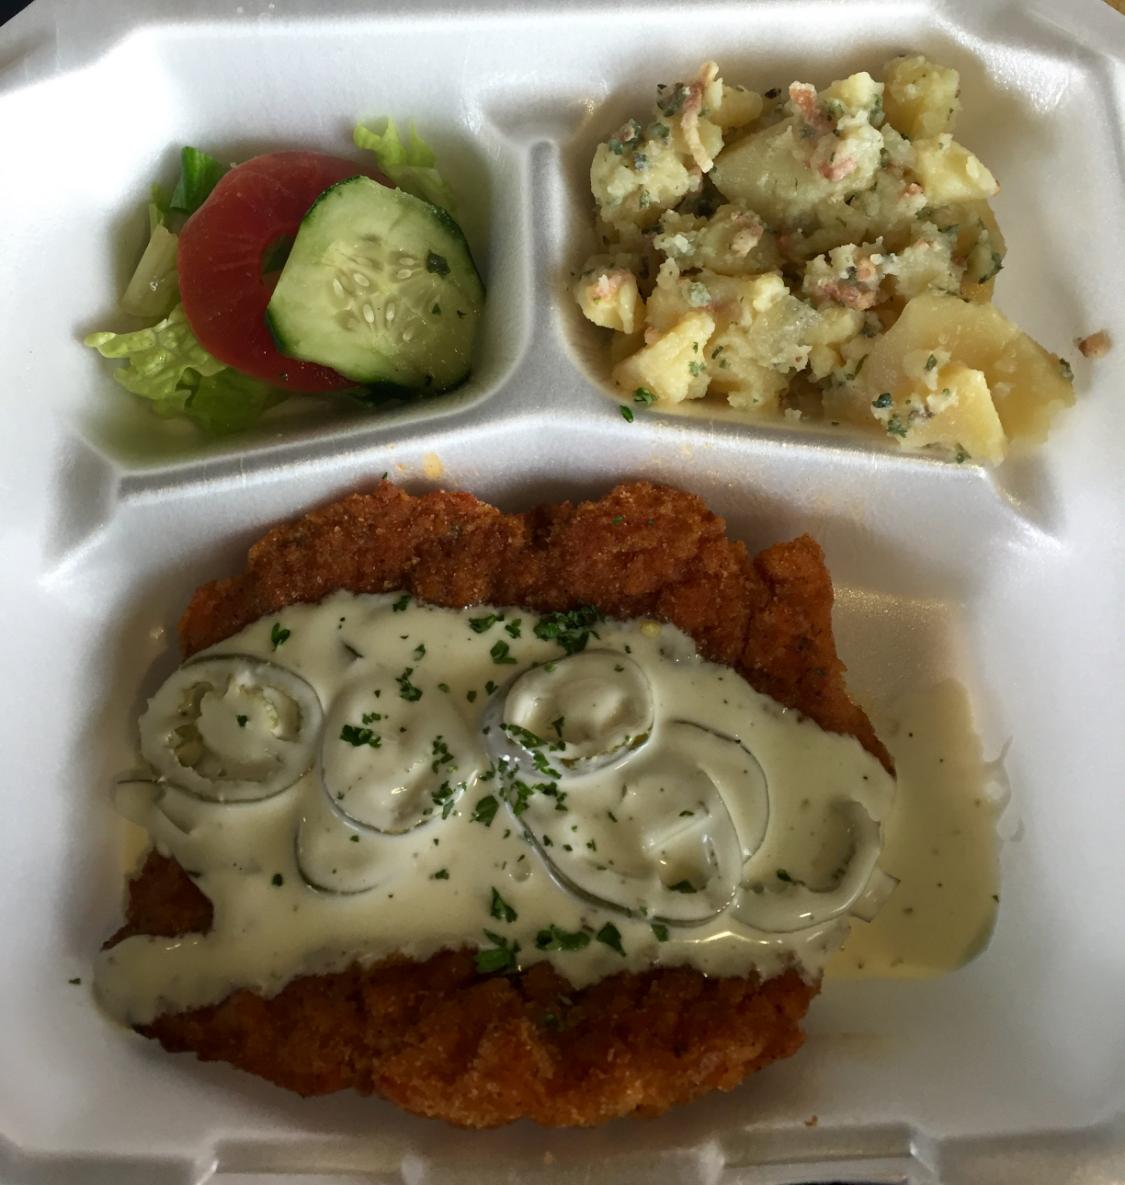 My jalapeno schnitzel with german potato salad